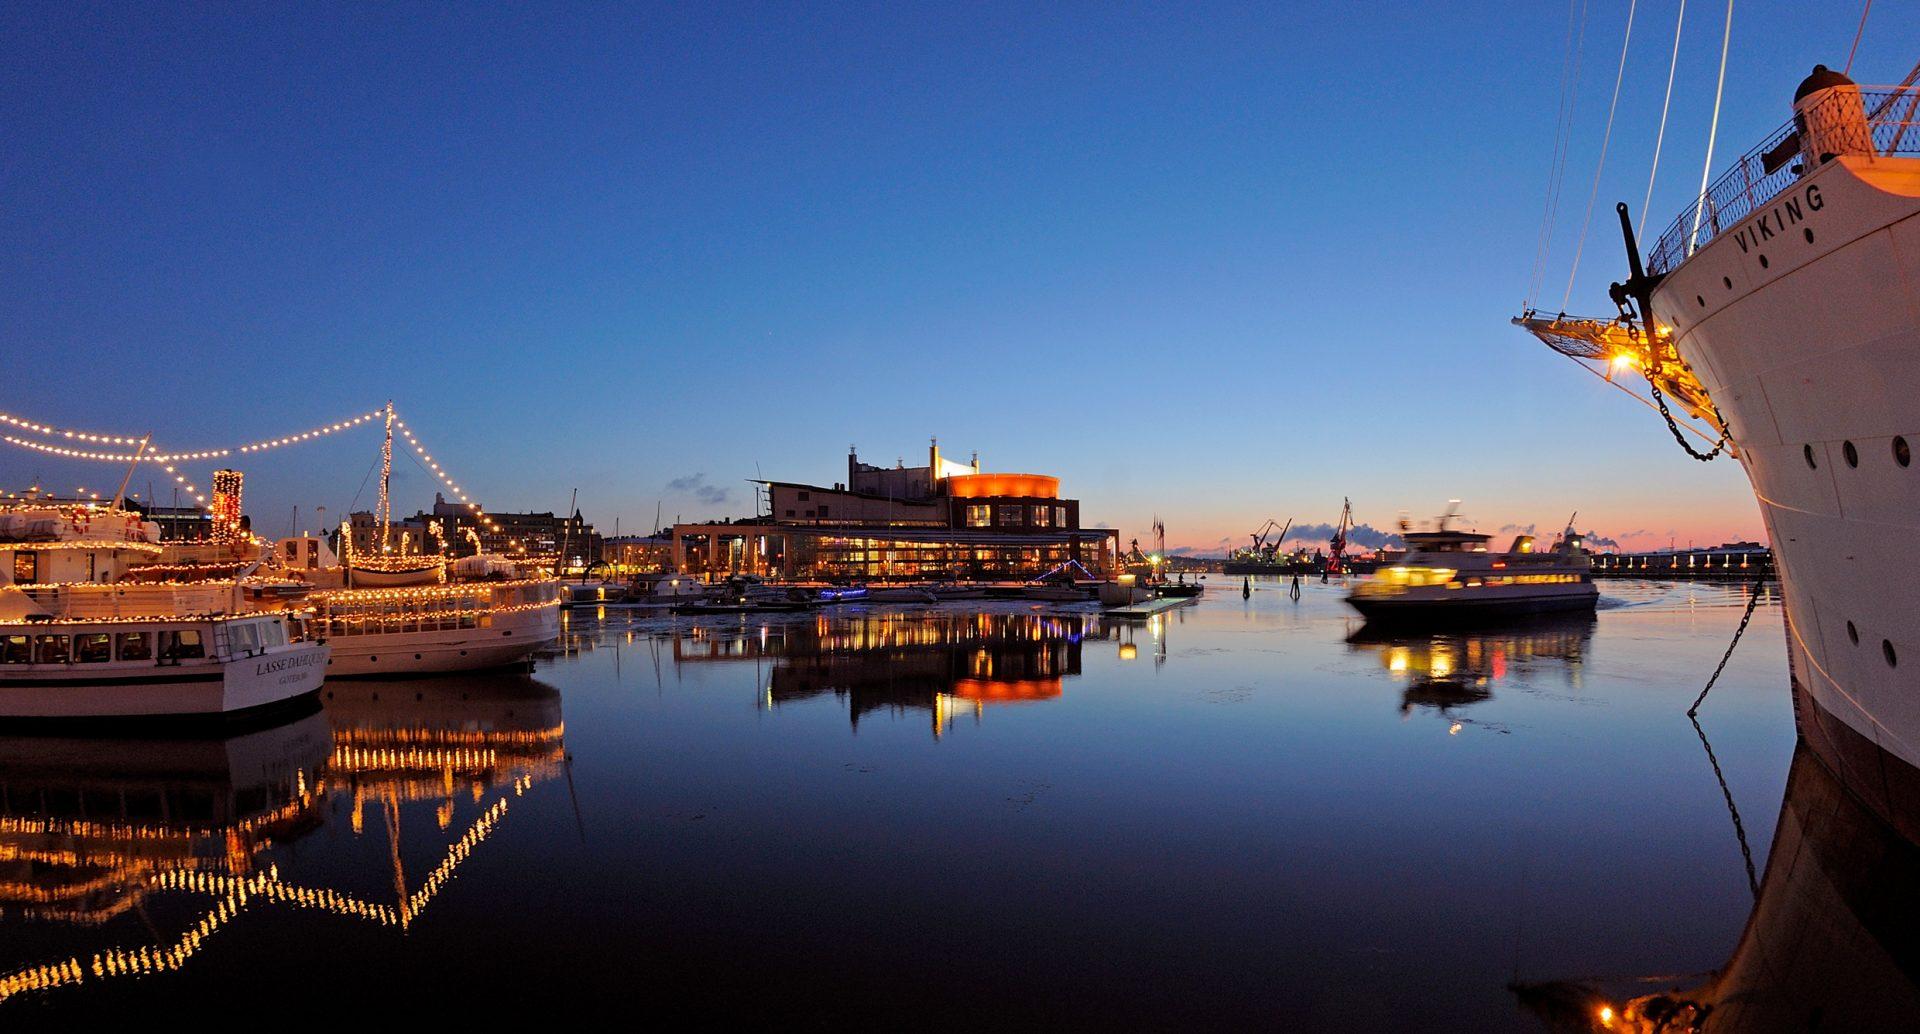 goeran_assner-gothenburg_harbour_-1491